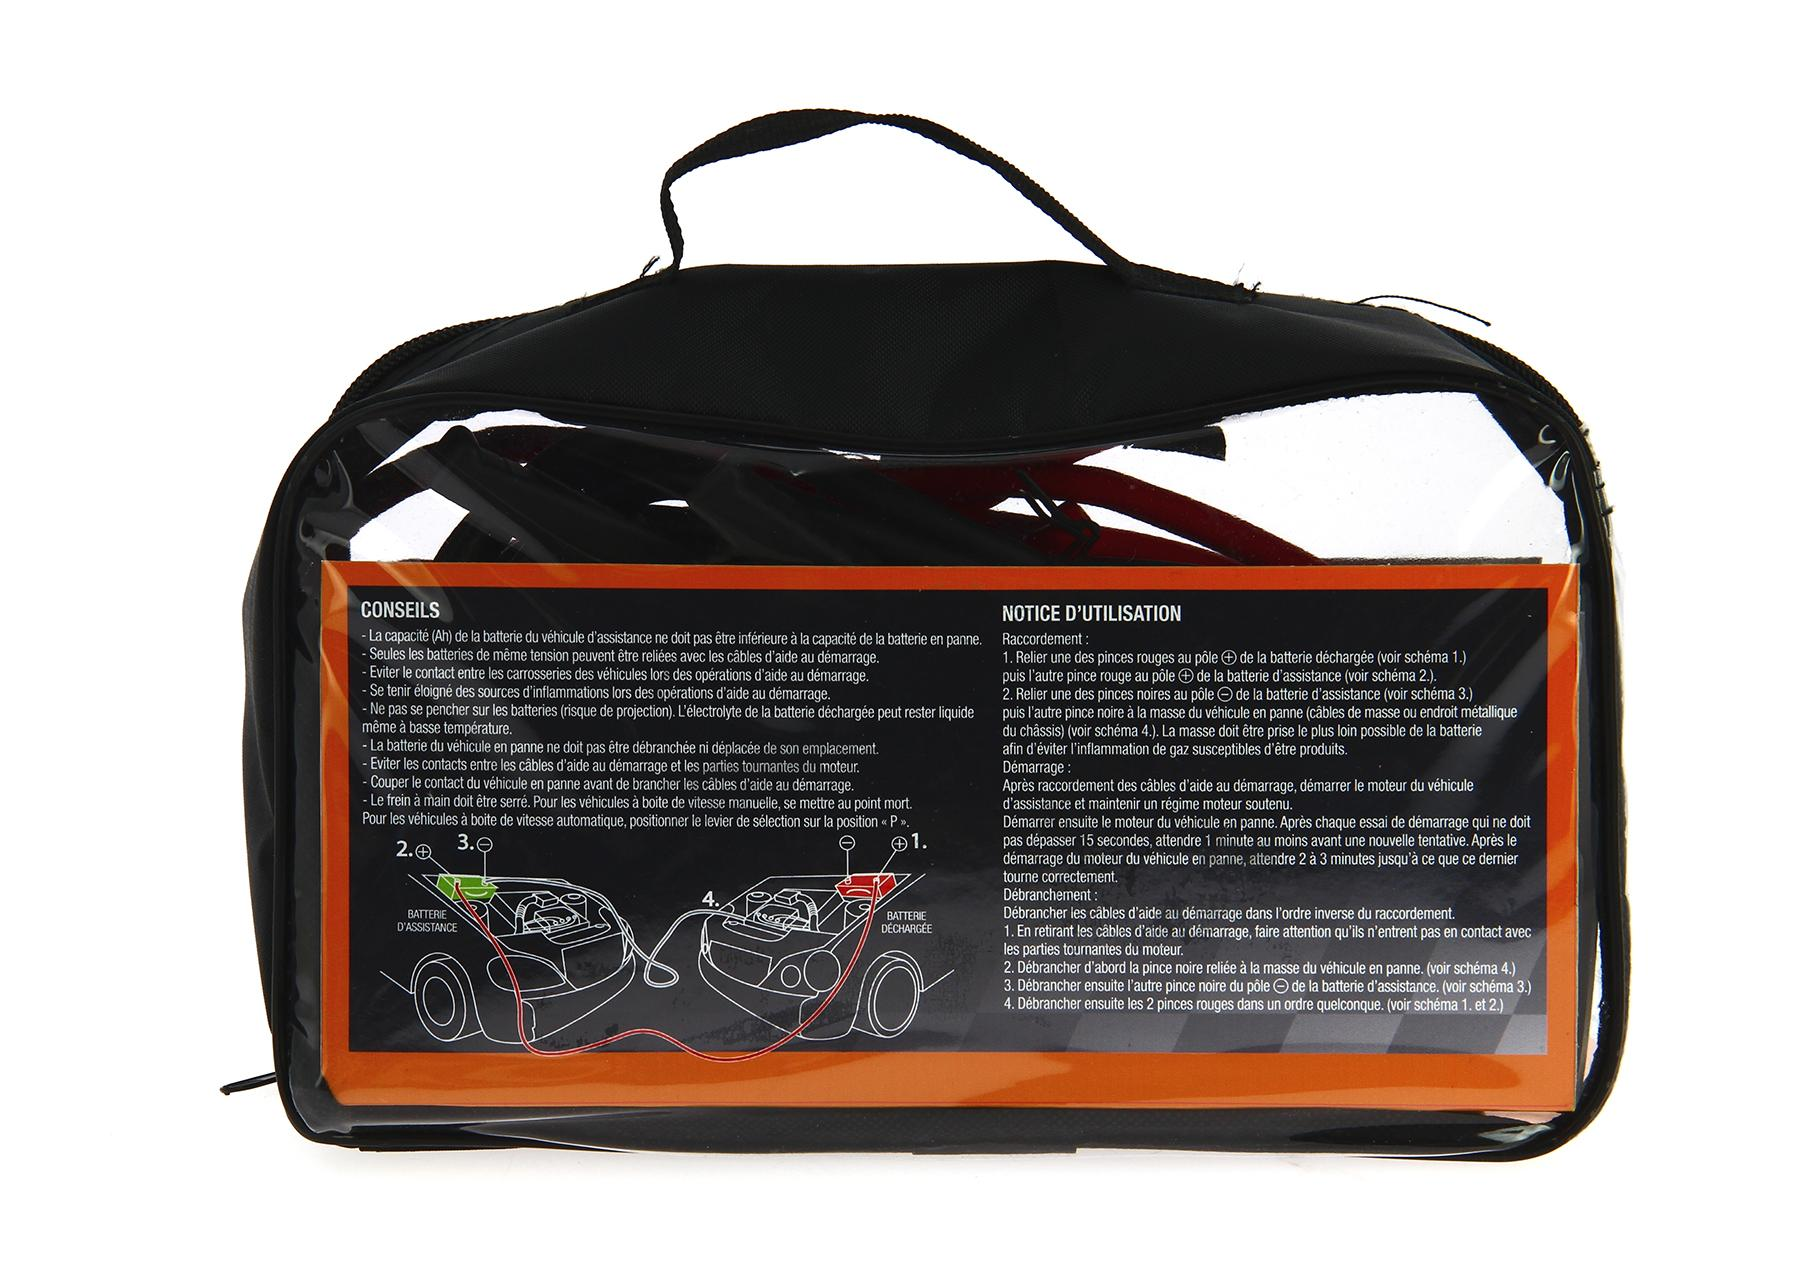 Startkablar XL 551030 Expertkunskap